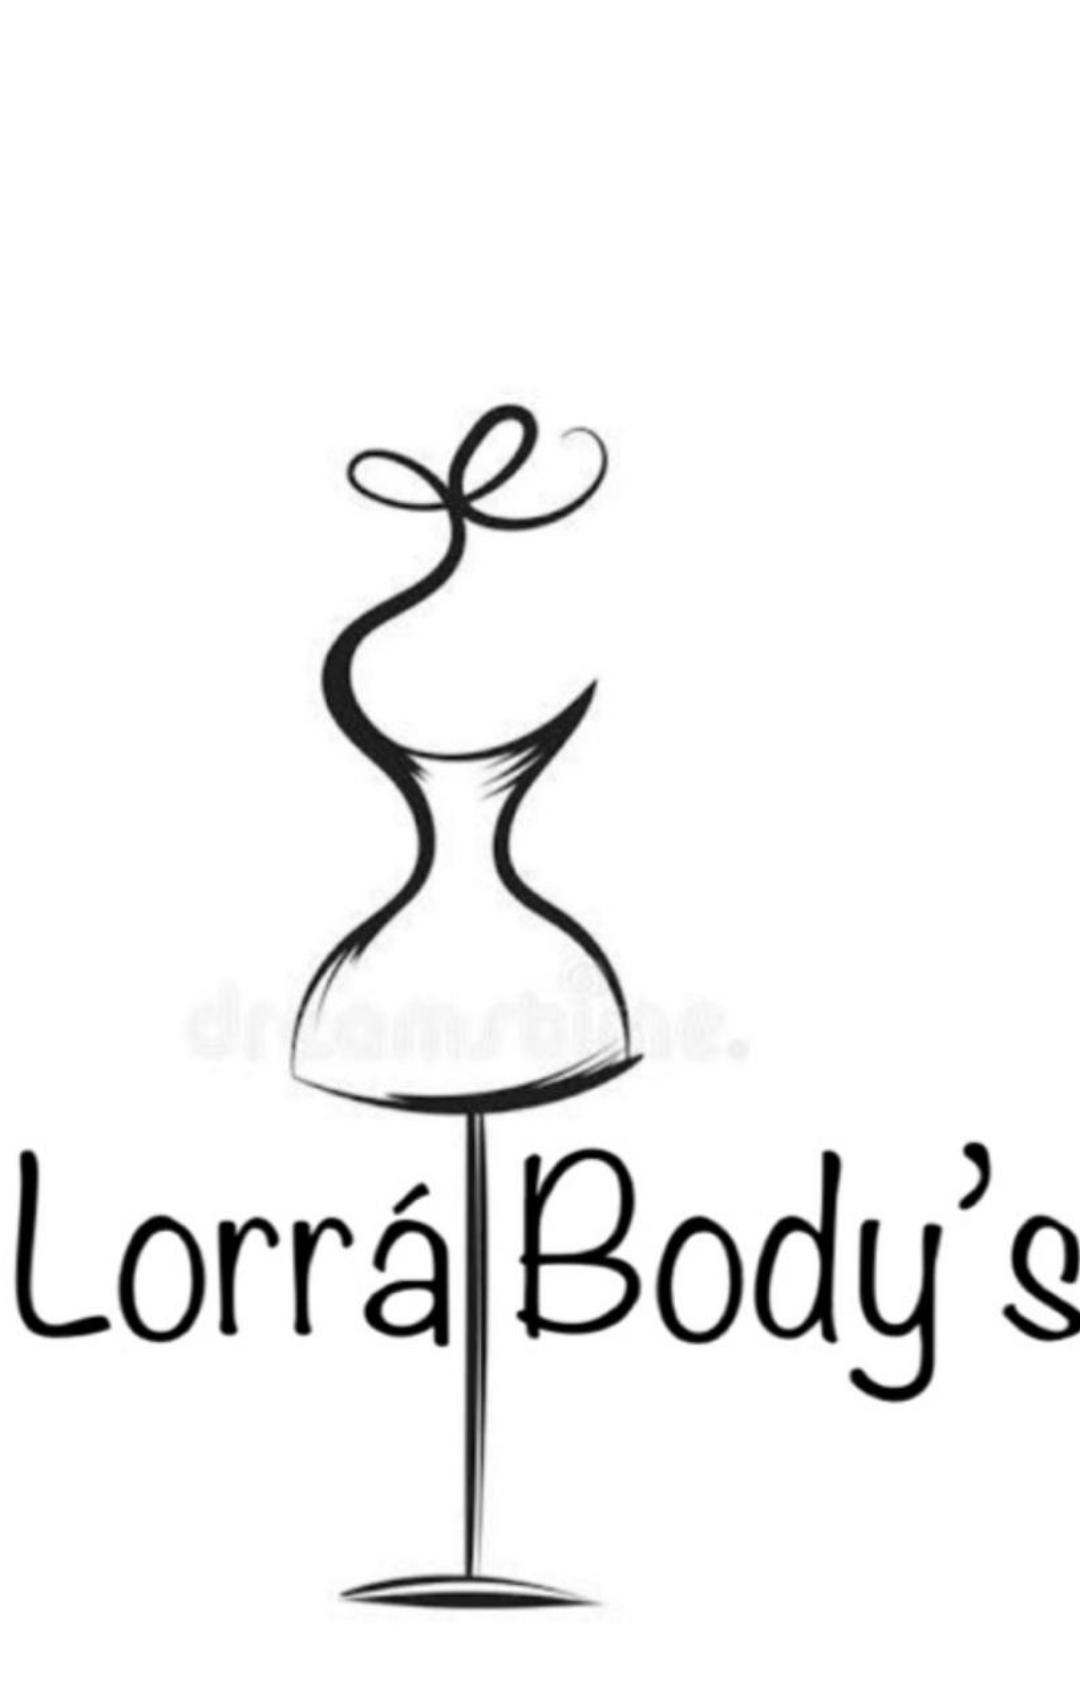 LORRÁ BODY'S